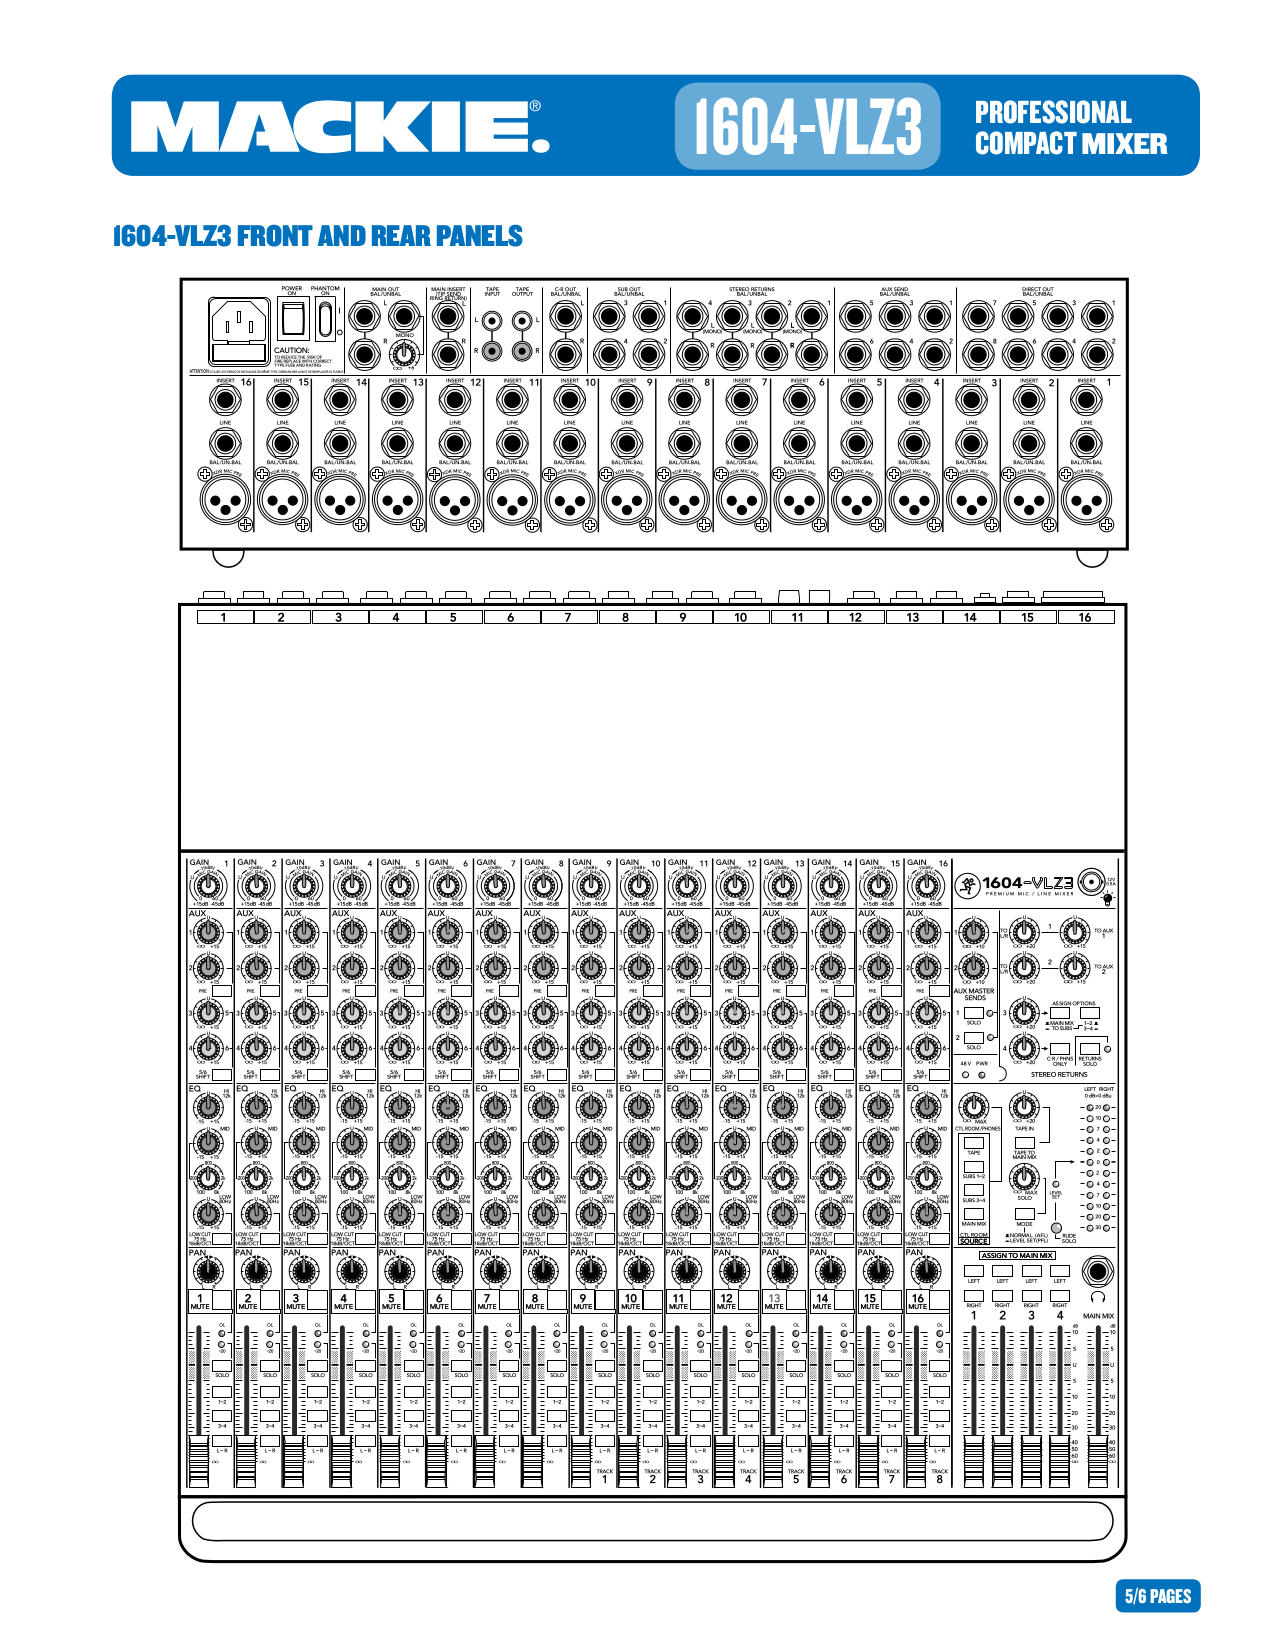 pdf manual for mackie other 1604 vlz pro line mixer rh umlib com mackie 1604 vlz pro manual pdf mackie 1604 vlz pro manual pdf